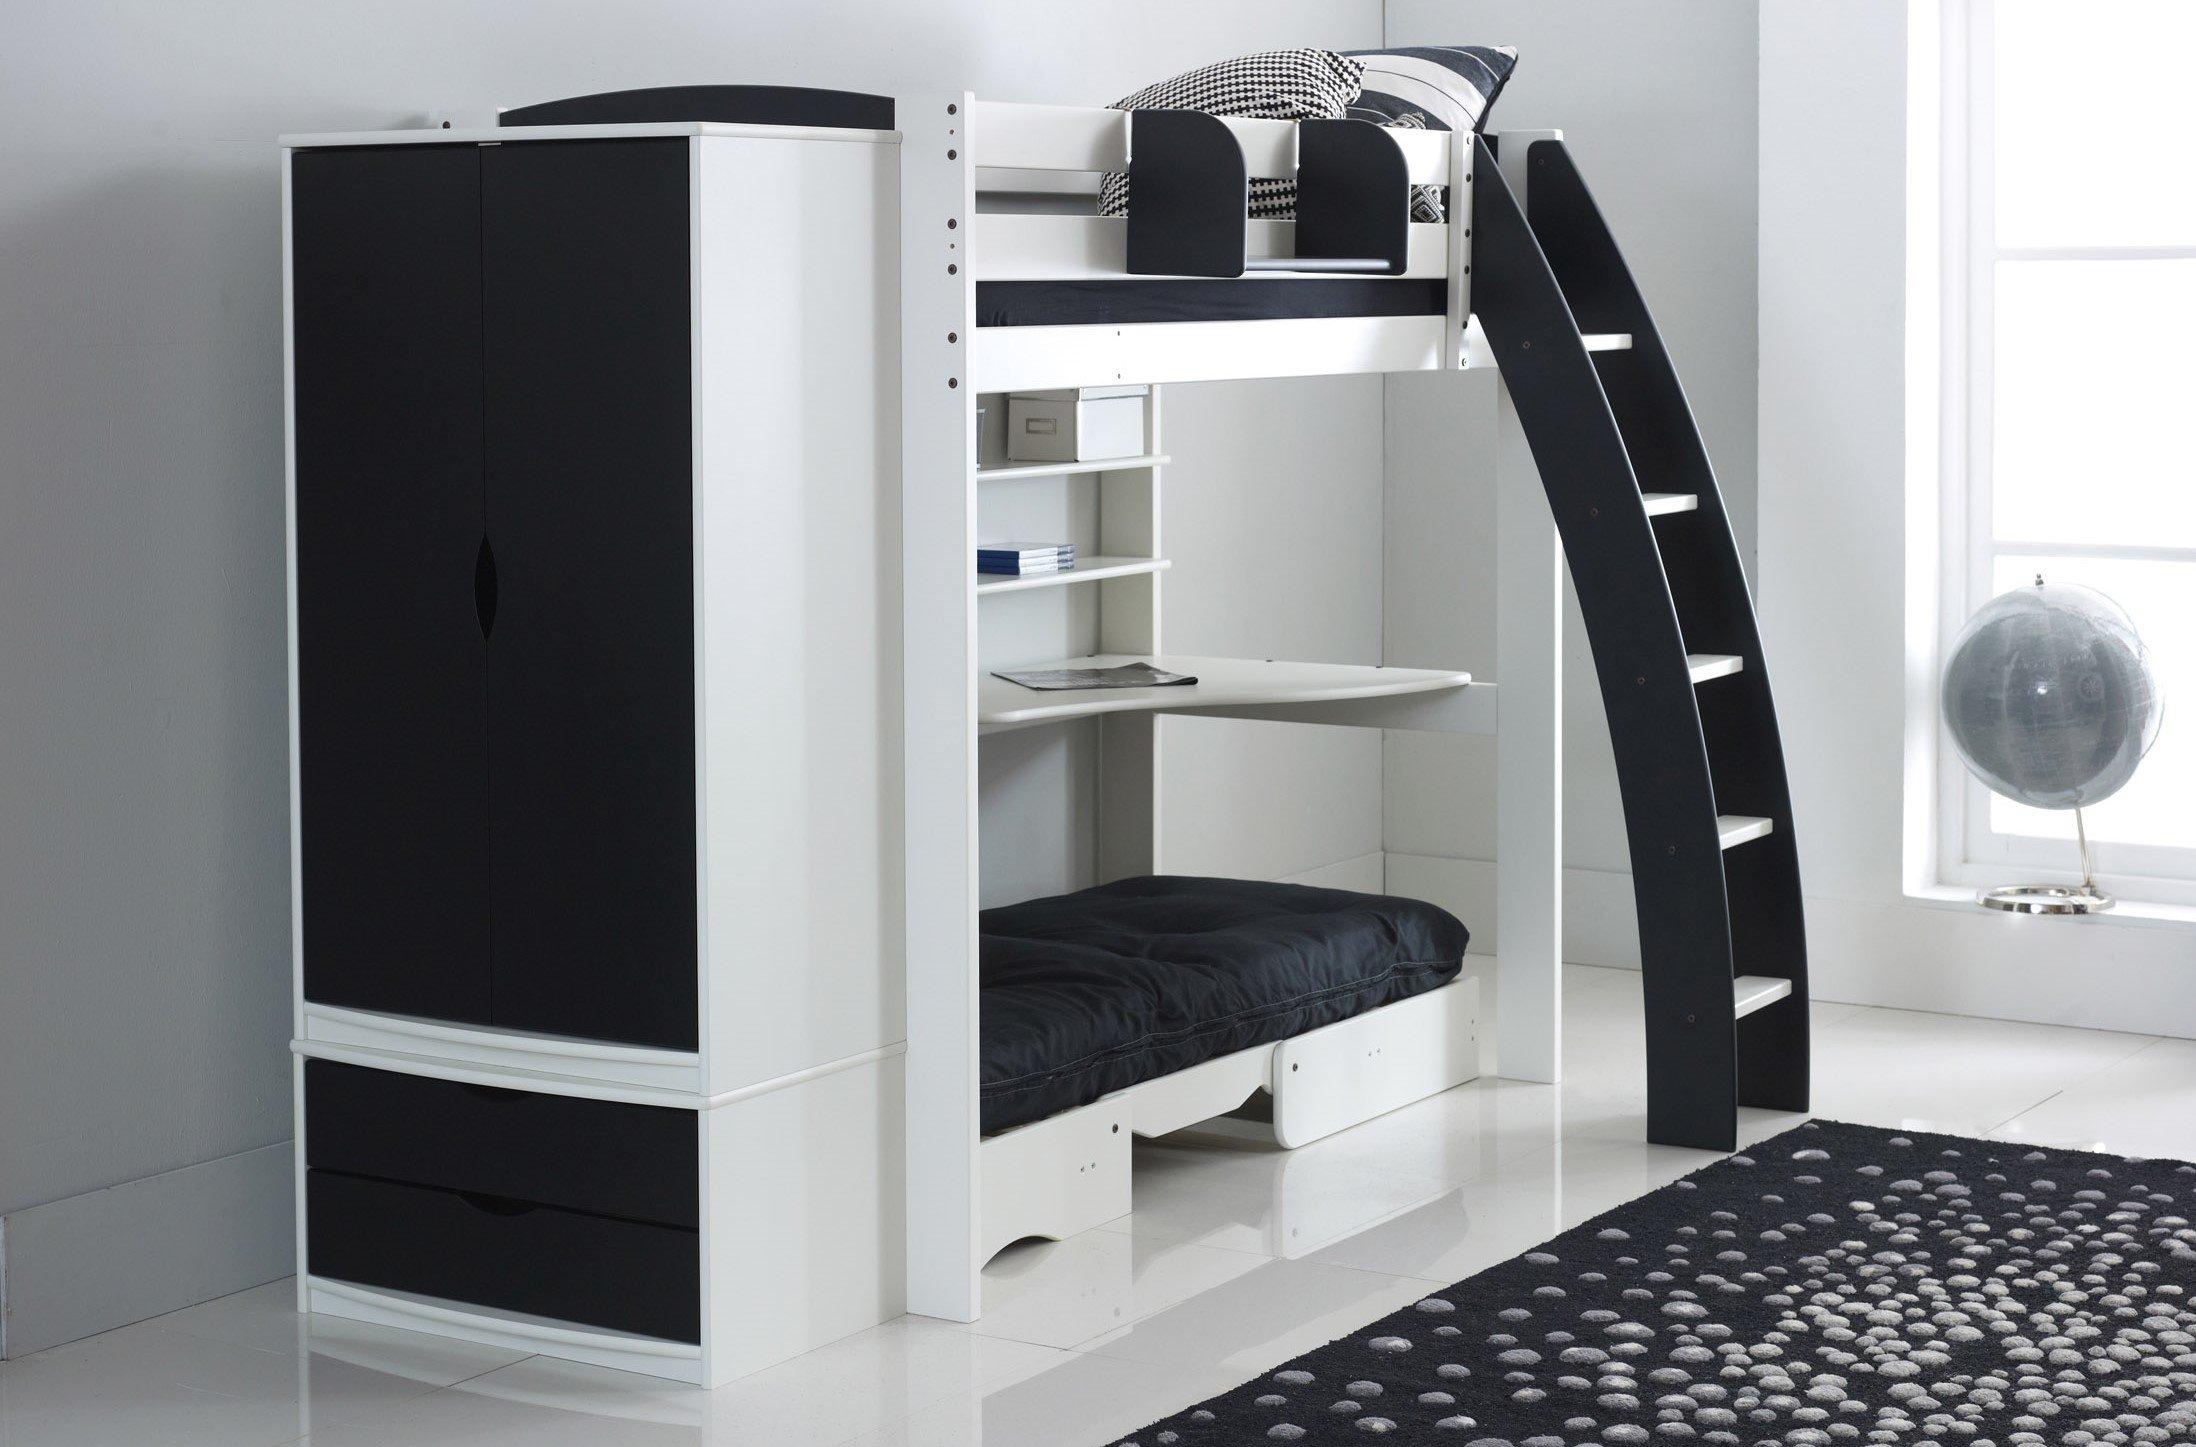 High Sleeper Bed With Desk Shelves Futon Drawers Wardrobe